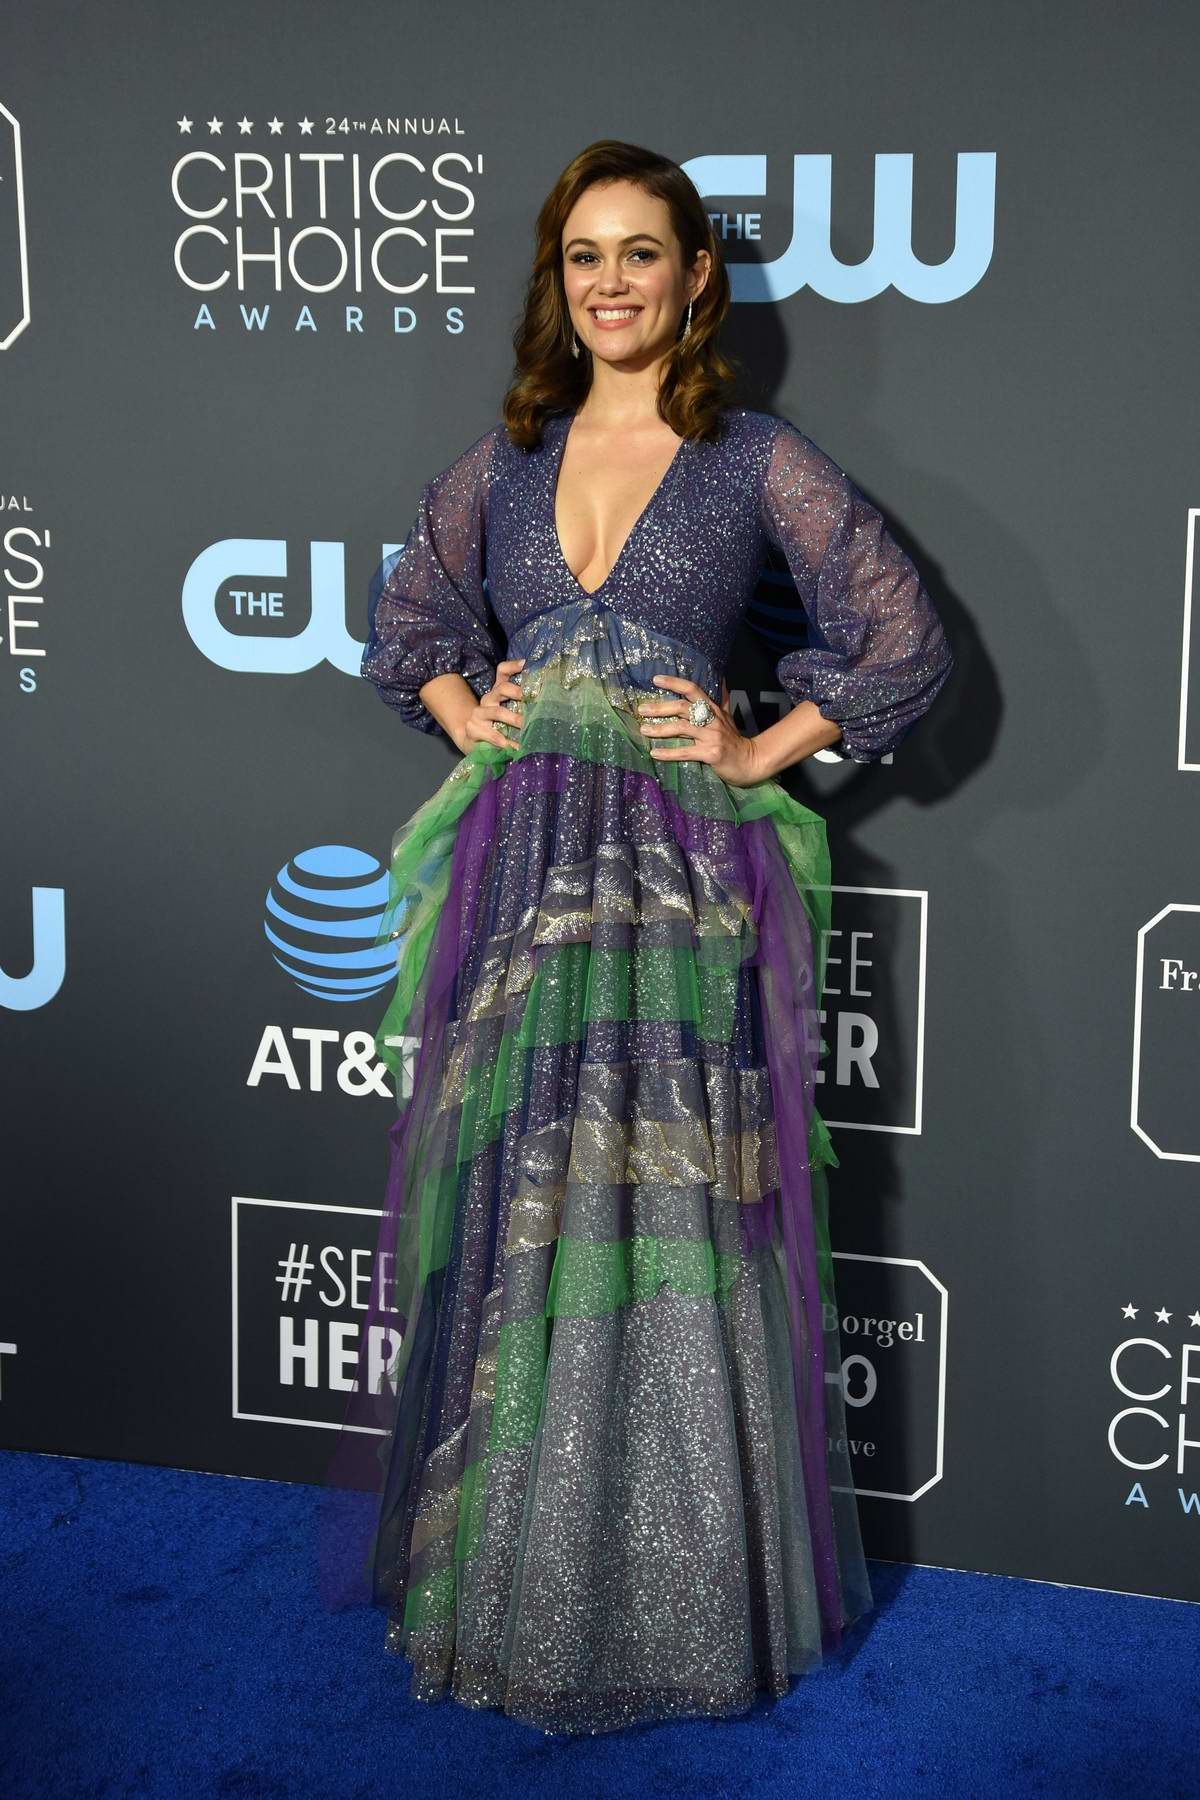 Dina Shihabi attends the 24th Annual Critics' Choice Awards at Barker Hangar in Santa Monica, California